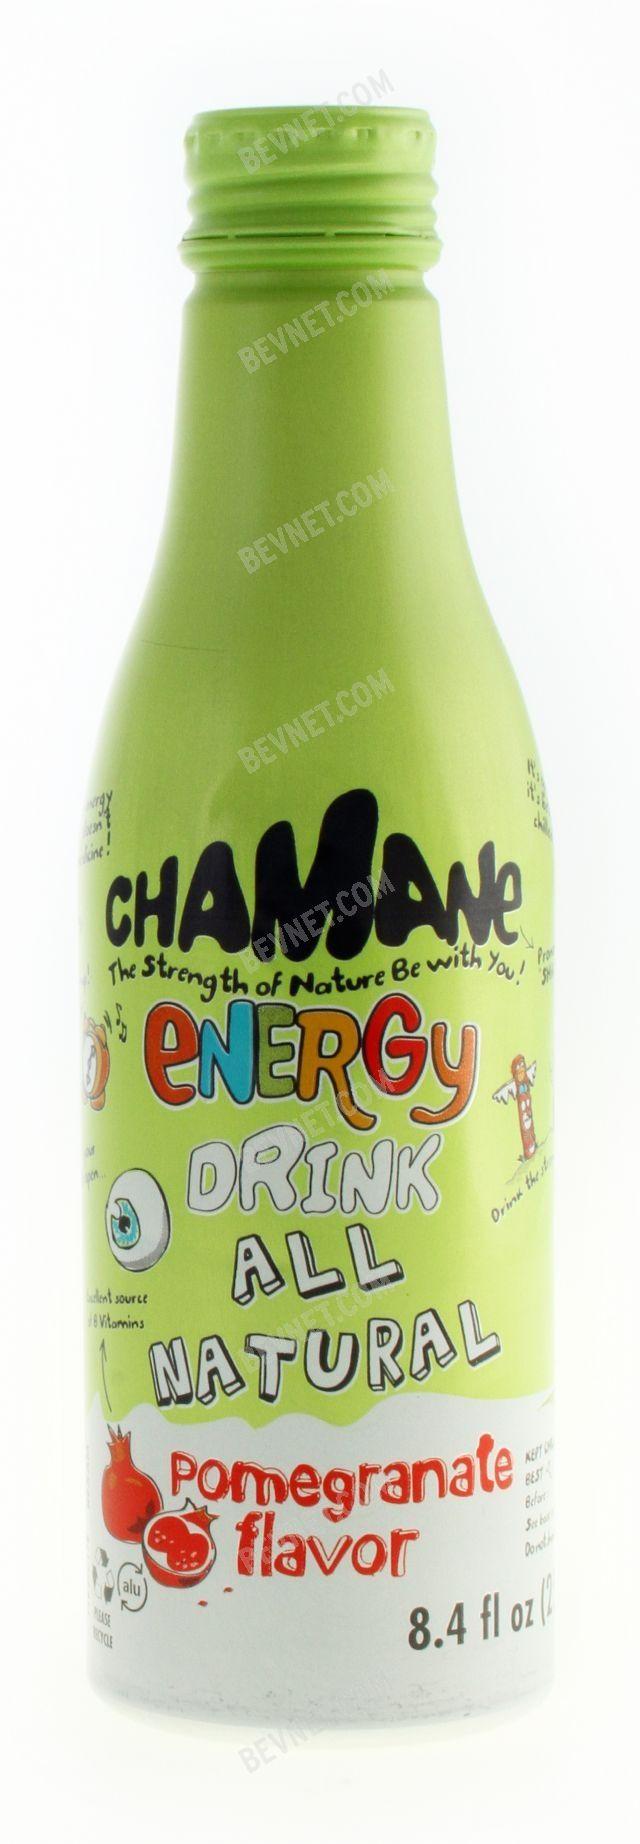 Chamane: